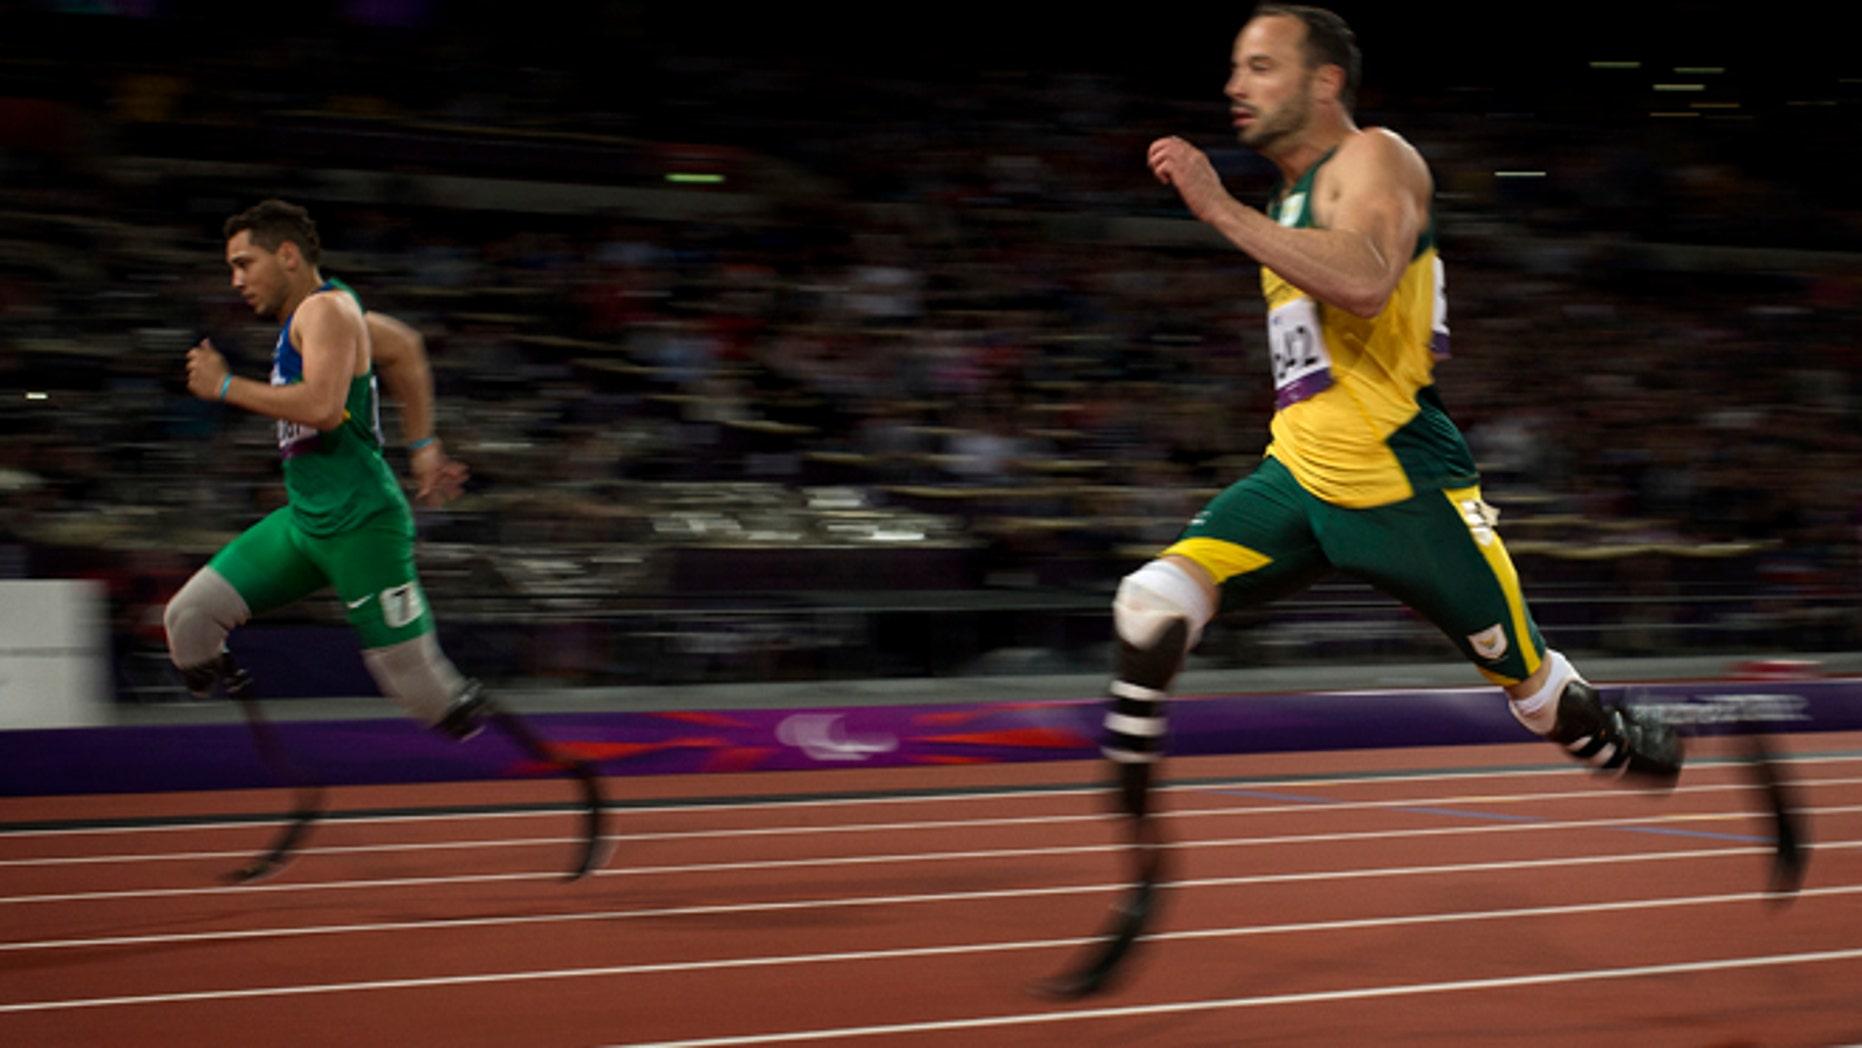 Sept. 2, 2012: Brazil's Alan Fonteles Cardoso Oliveira, left, beats South Africa's Oscar Pistorius in the 200-meter sprint at the 2012 Paralympics.